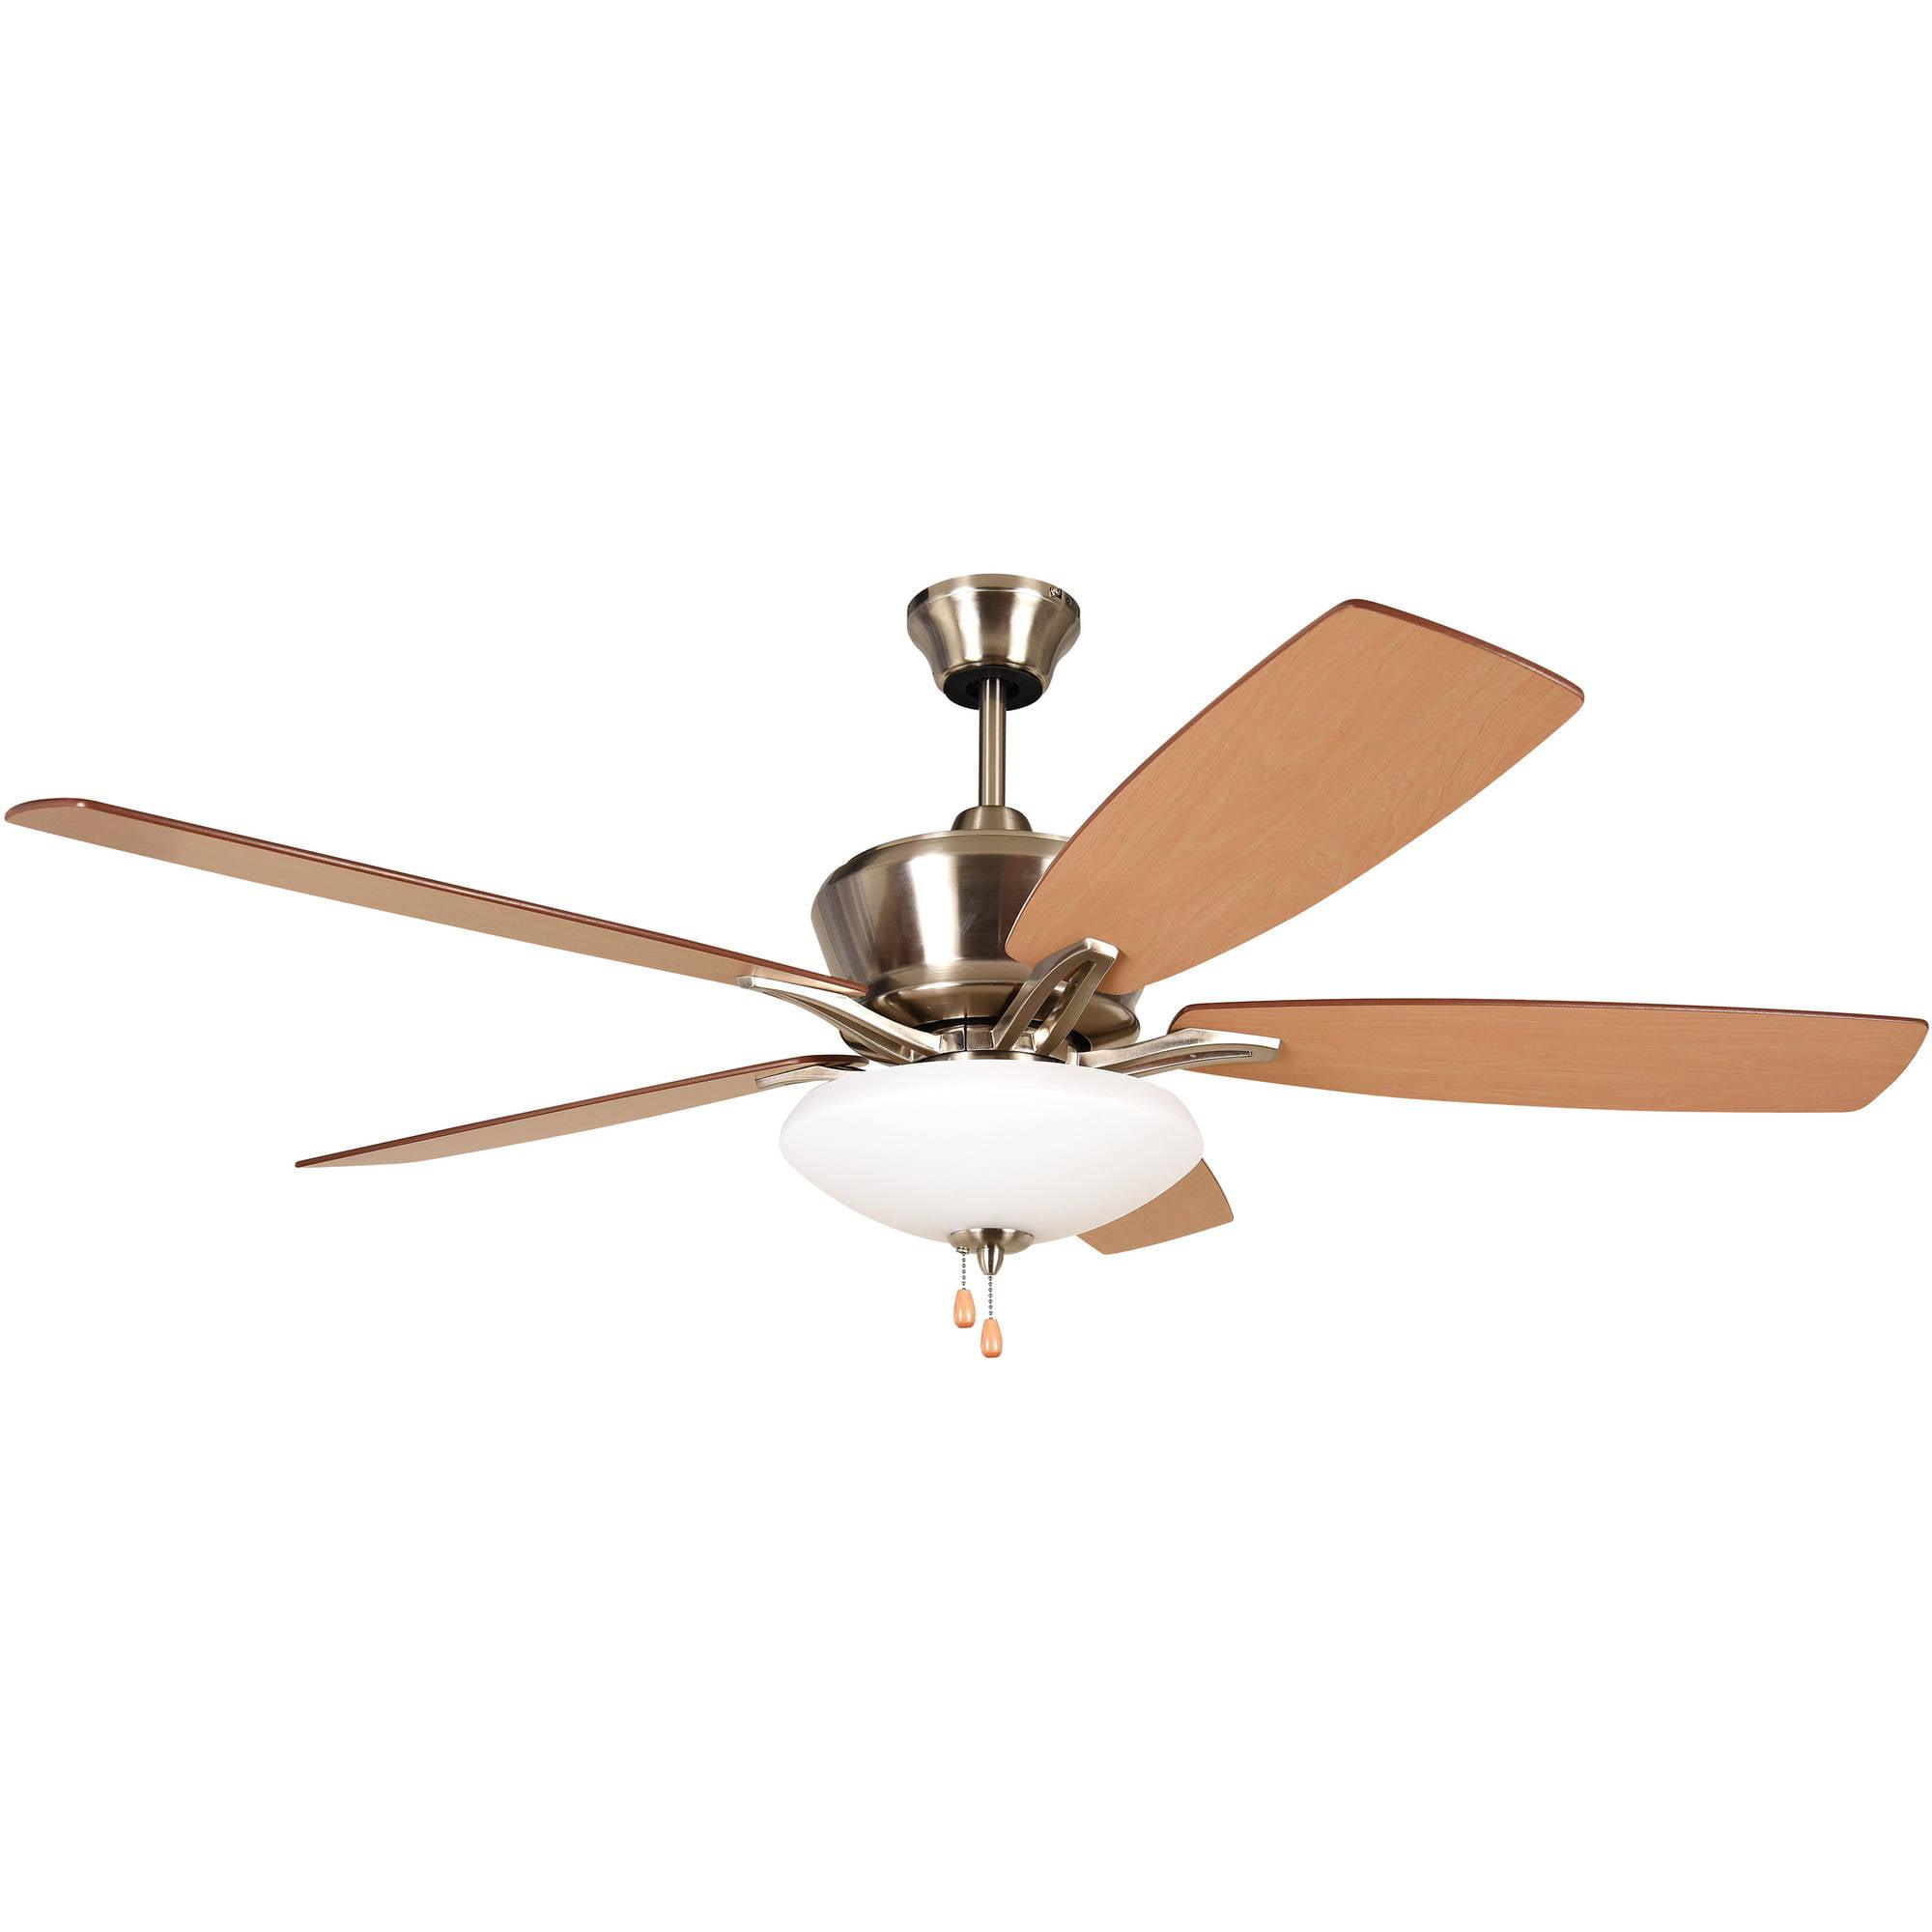 Litex Industries Kala 52 Quot Dual Mount Ceiling Fan Brushed